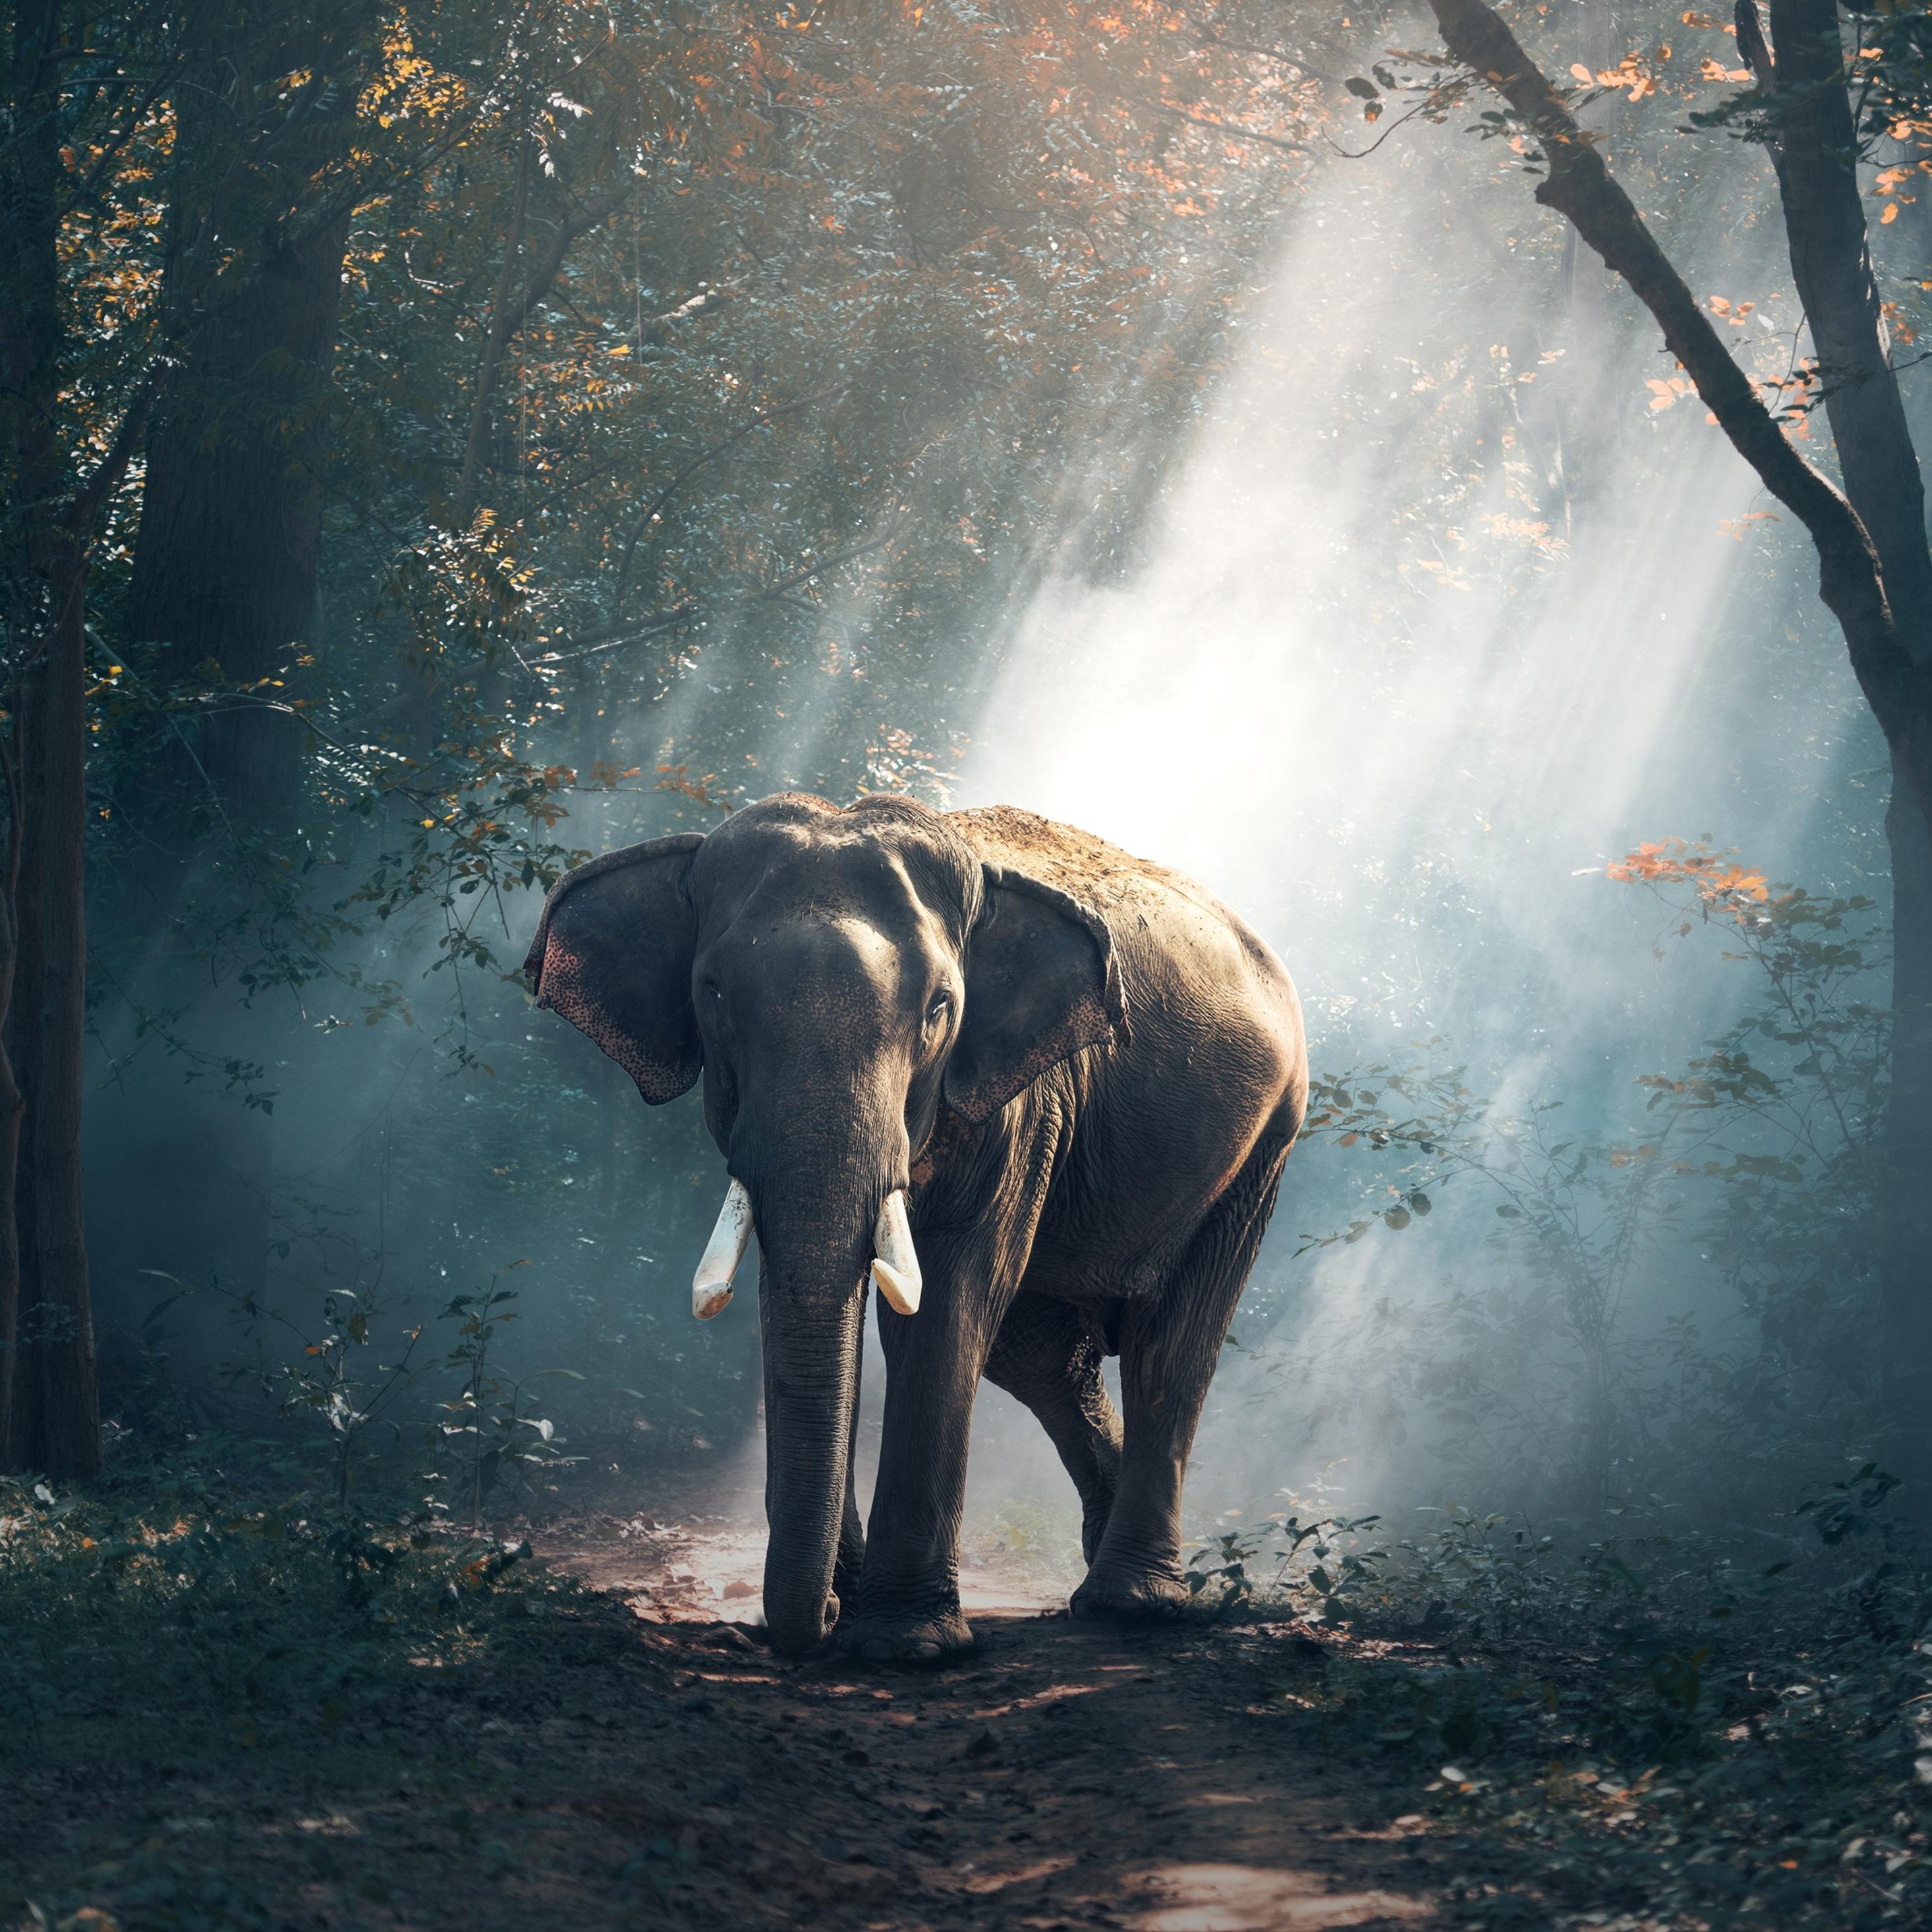 13+ Ipad Wallpaper Elephant Images